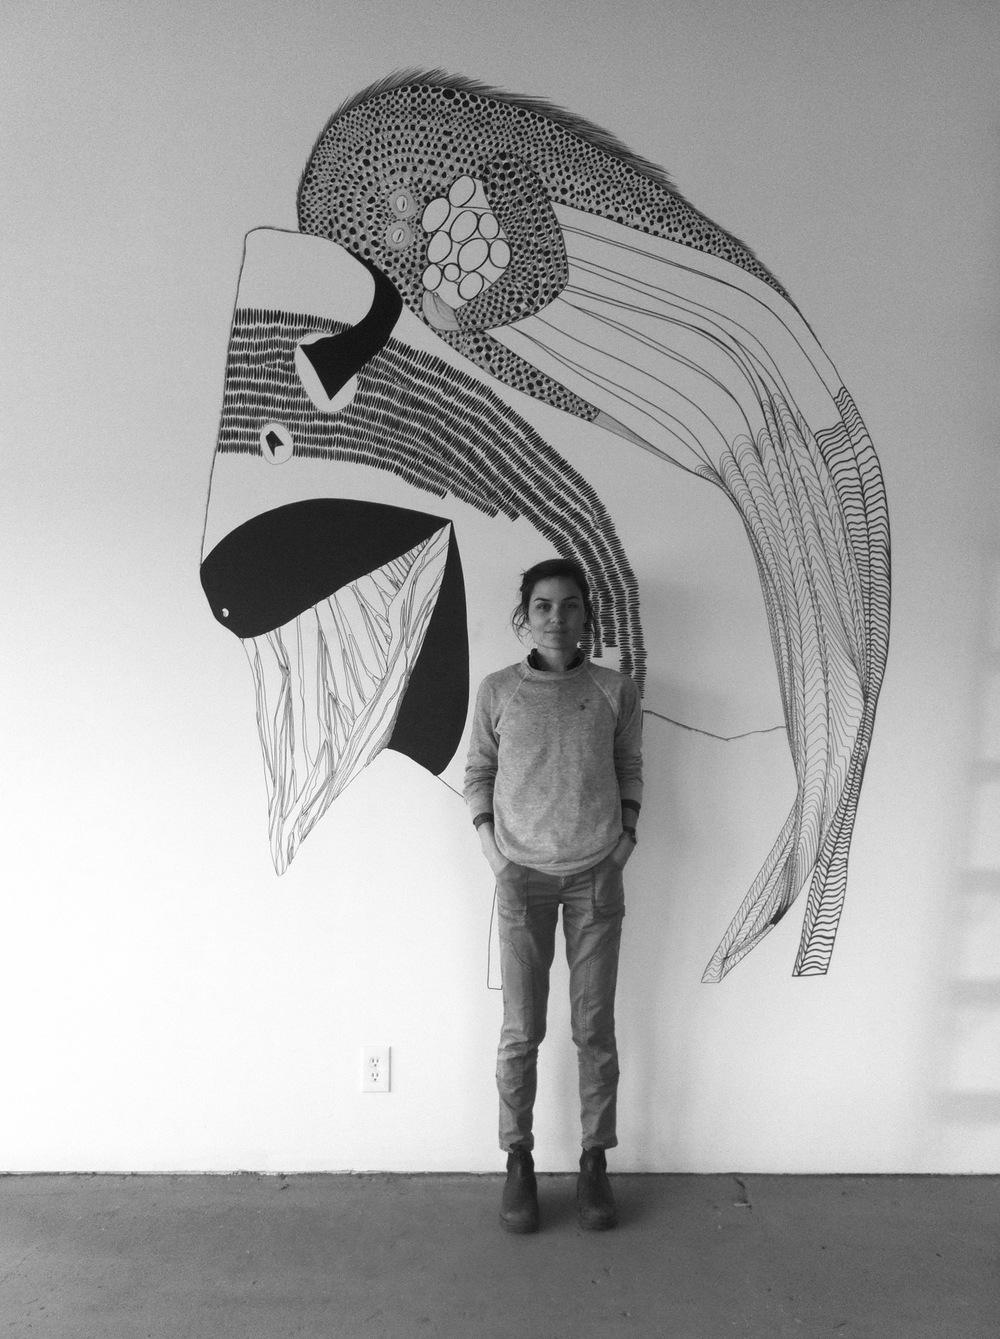 Artist Lana Fee Rasmussen